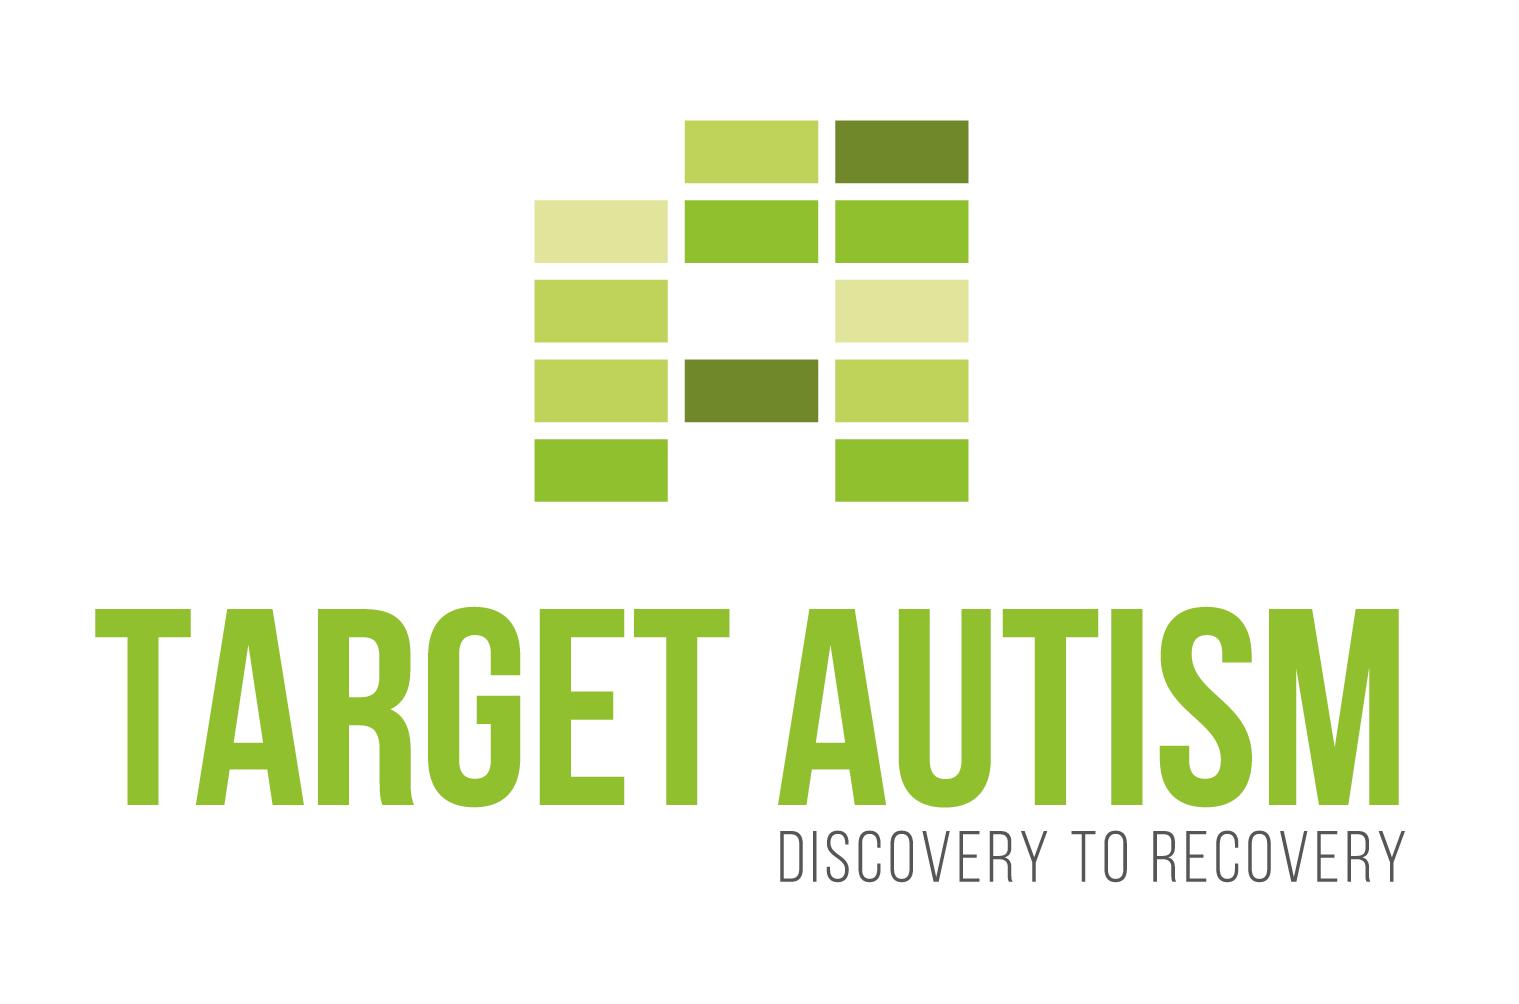 Target Autism